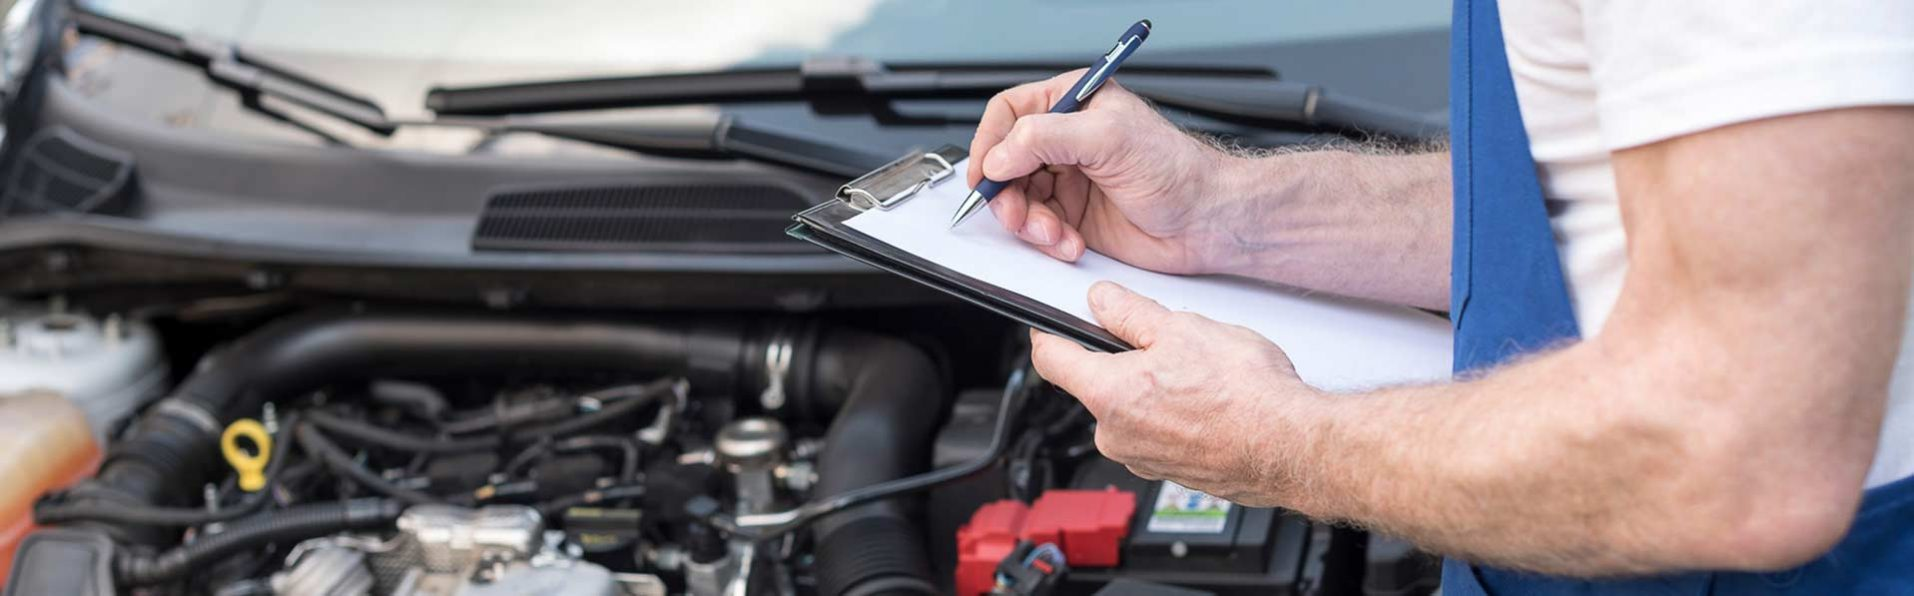 servicios de mecanica ford sevilla